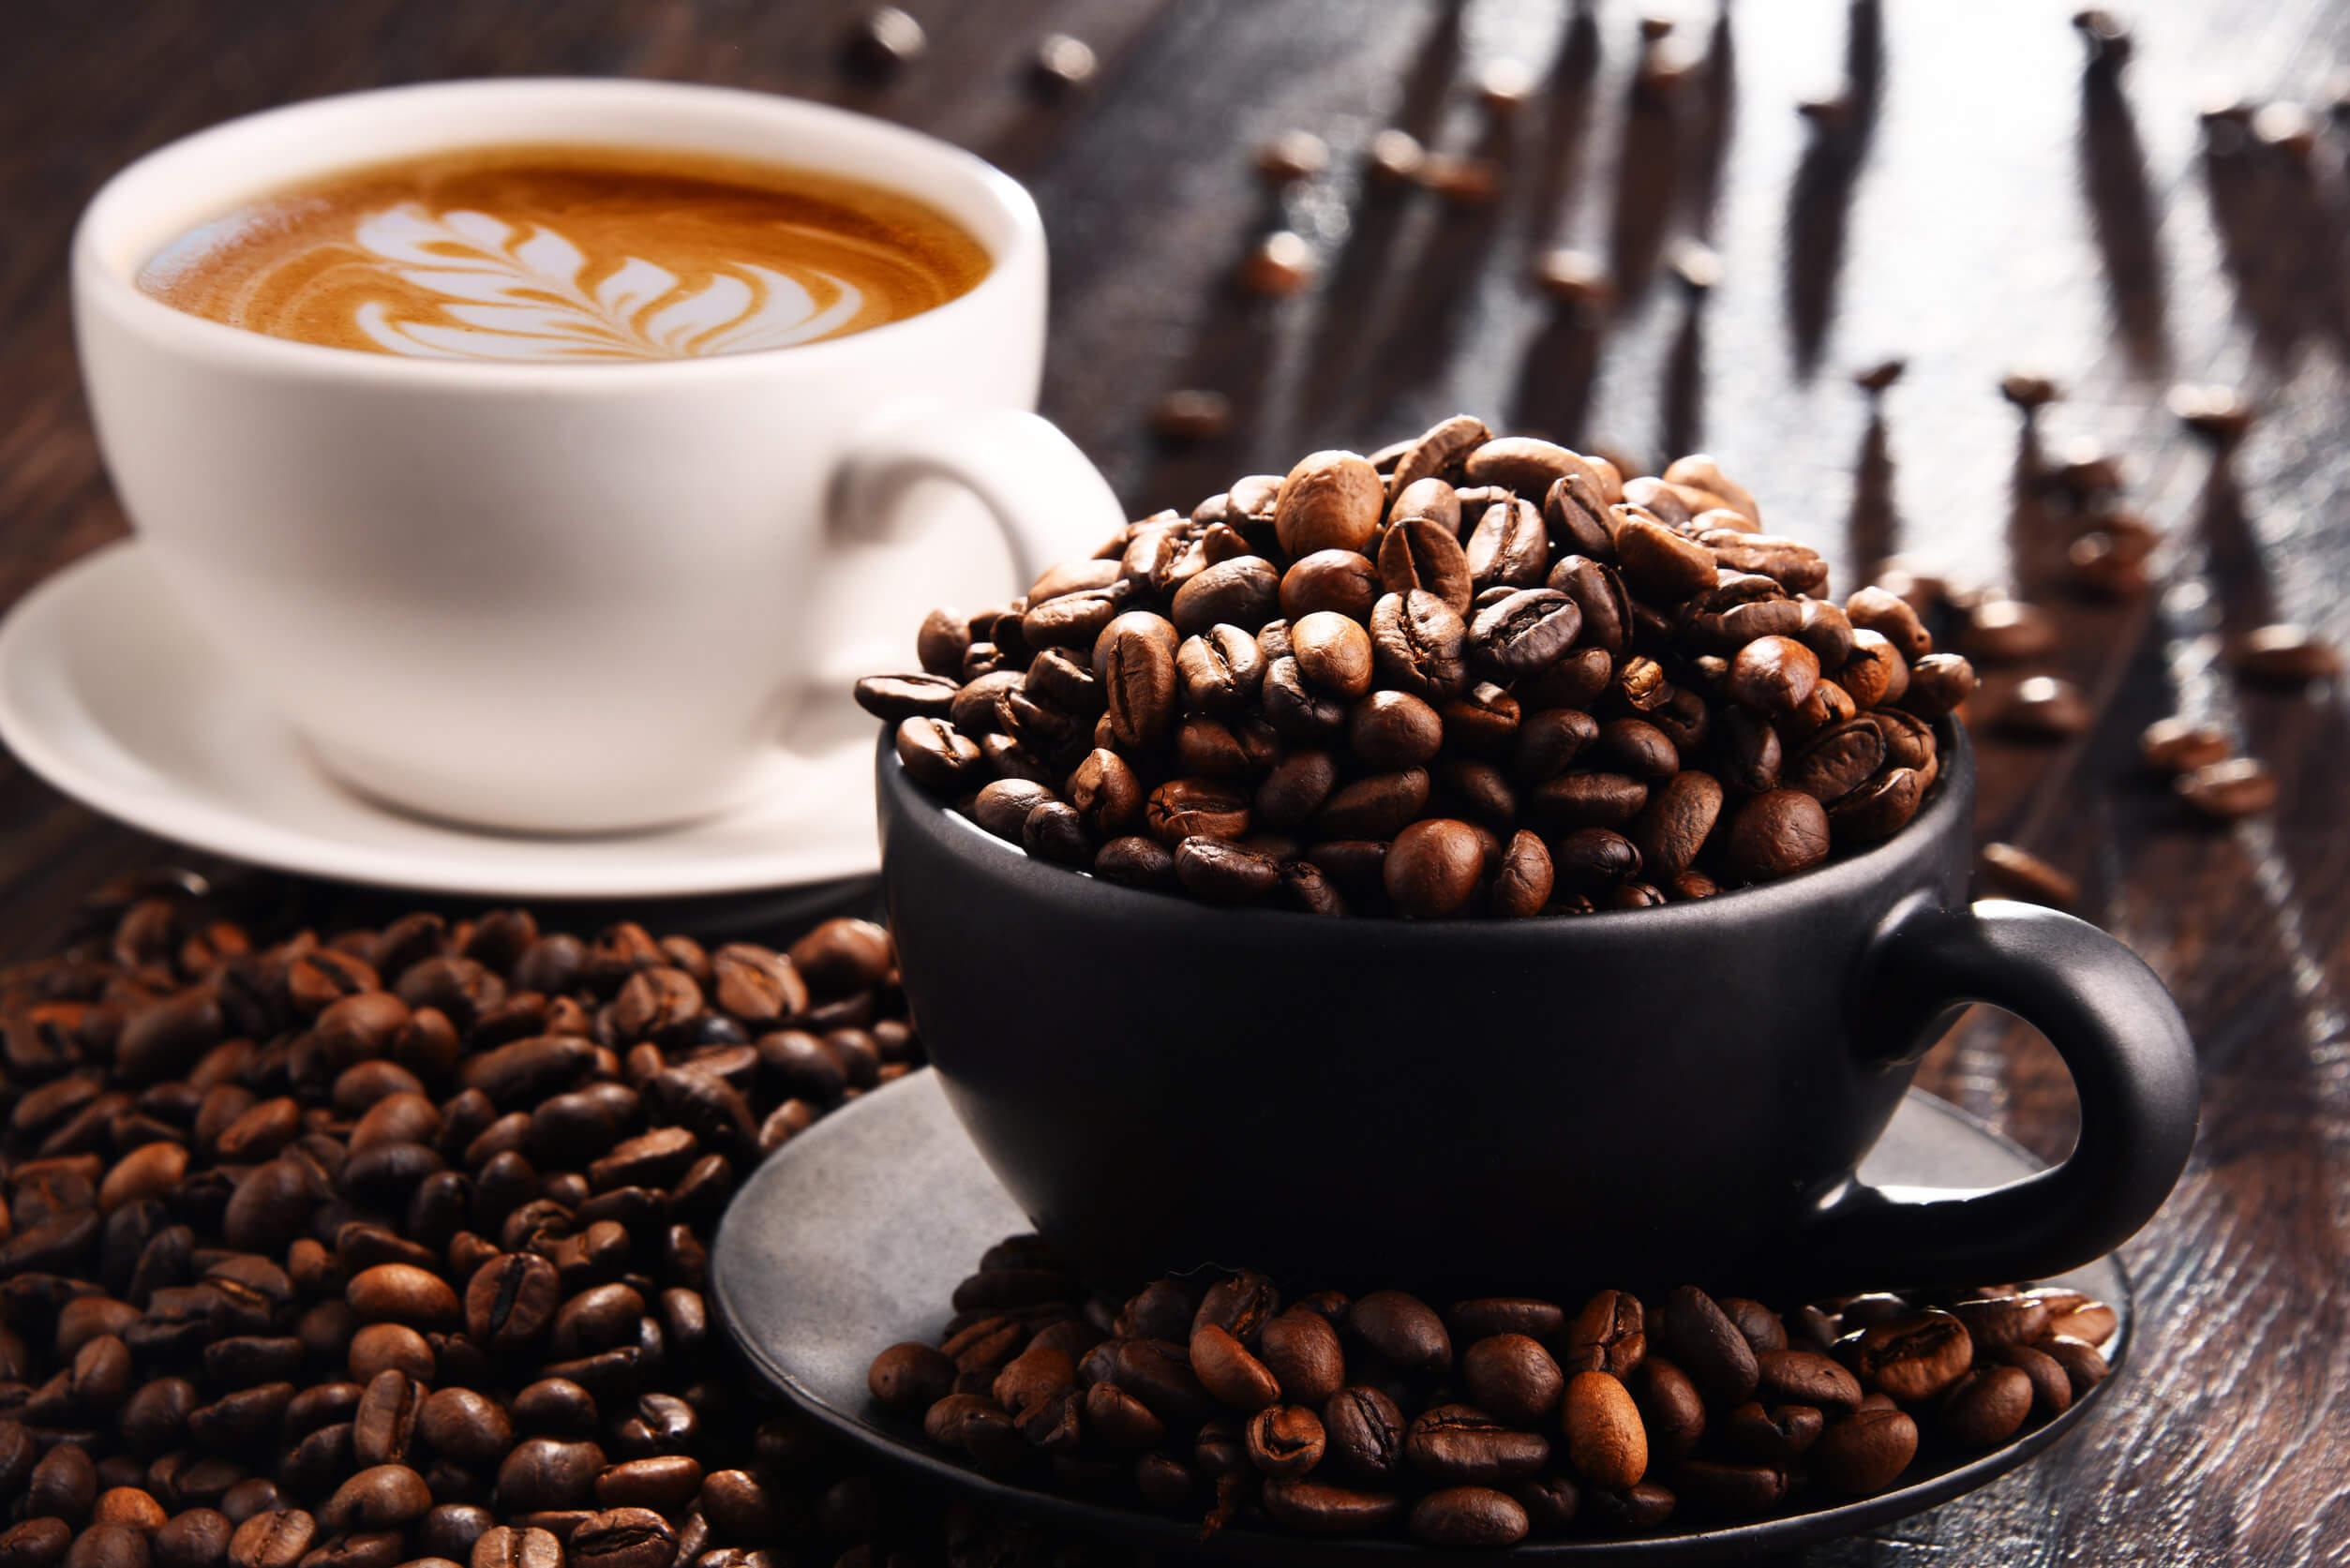 5 propiedades del café que desconocías